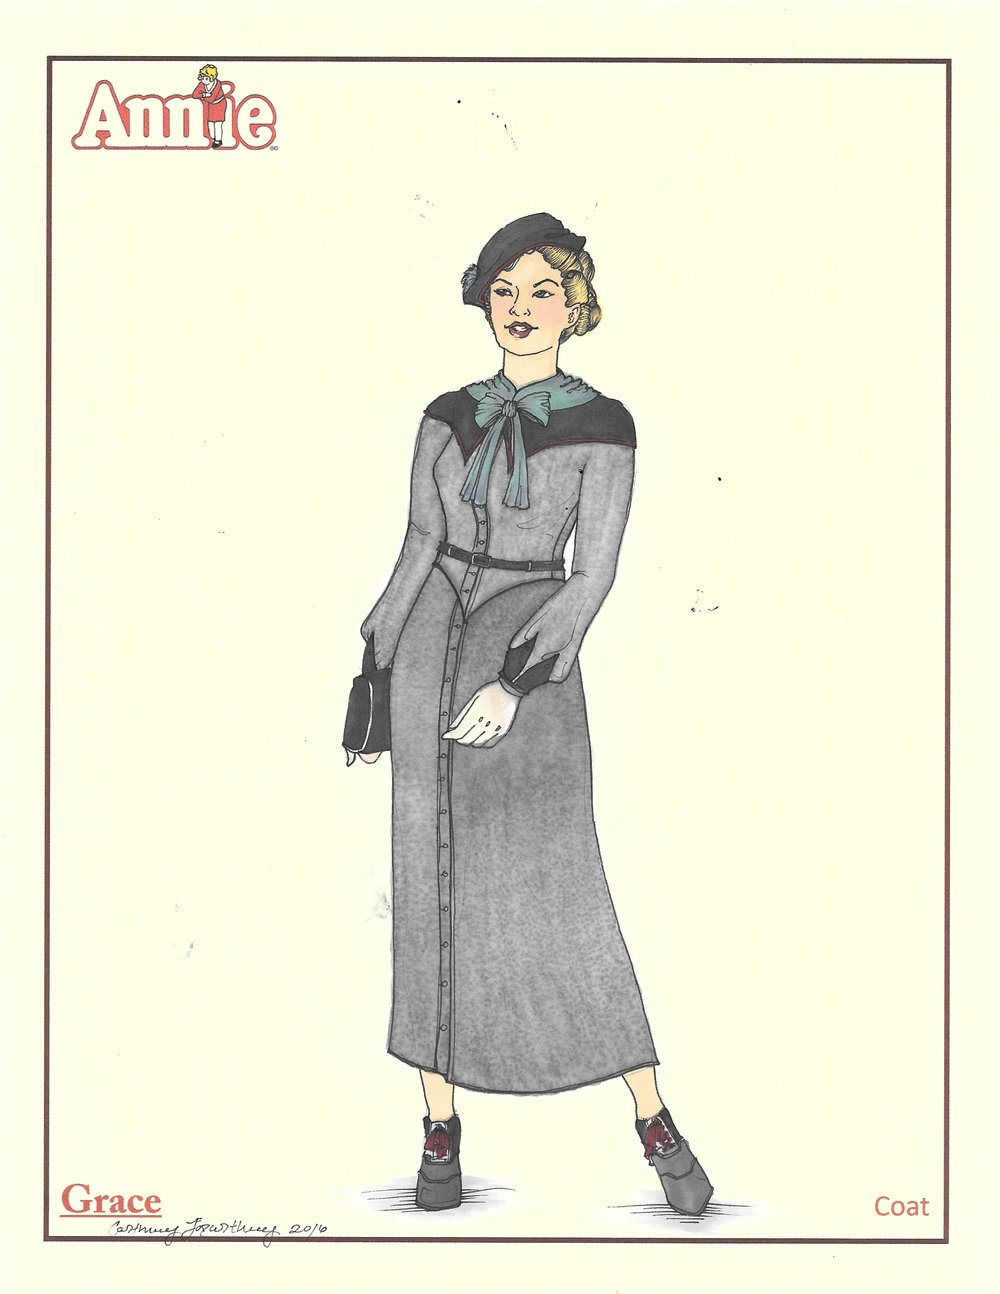 Grace: Coat